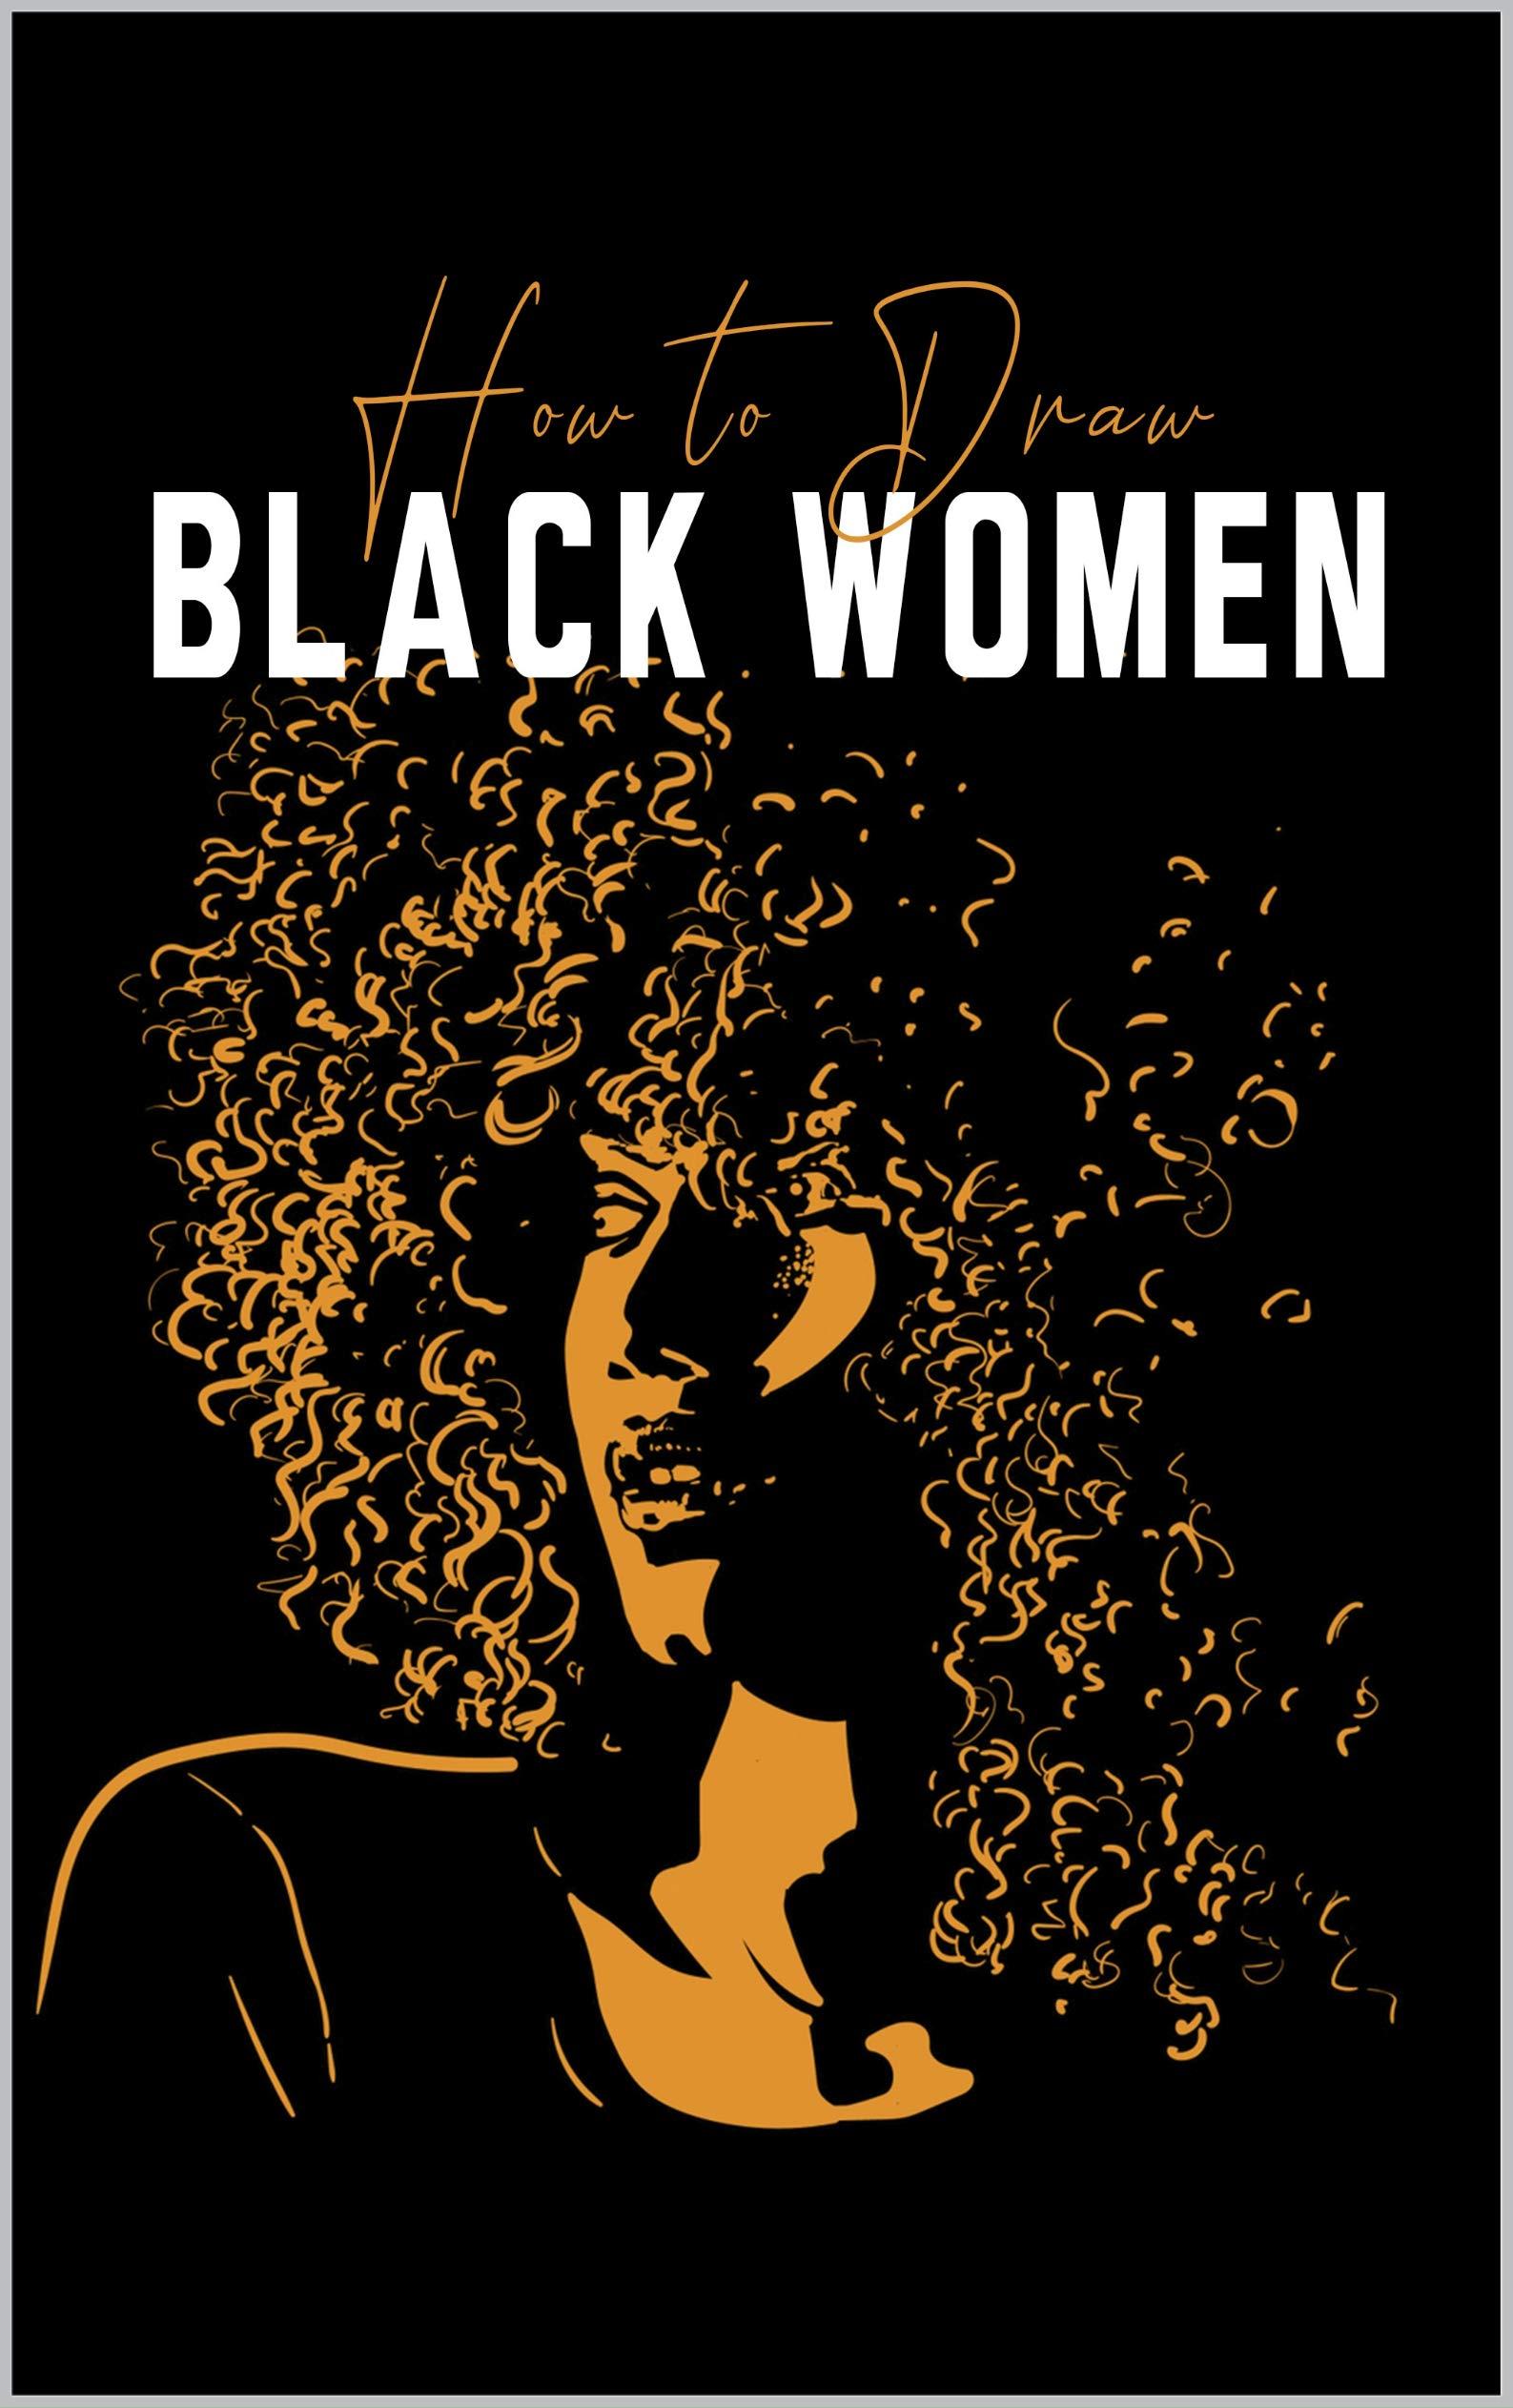 How to Draw Black Women: How to Draw Black People, How to Draw Black People for Beginners, Draw Black People Step by Step, Draw Black People Easy, Draw Black People, How to Draw Black Girls